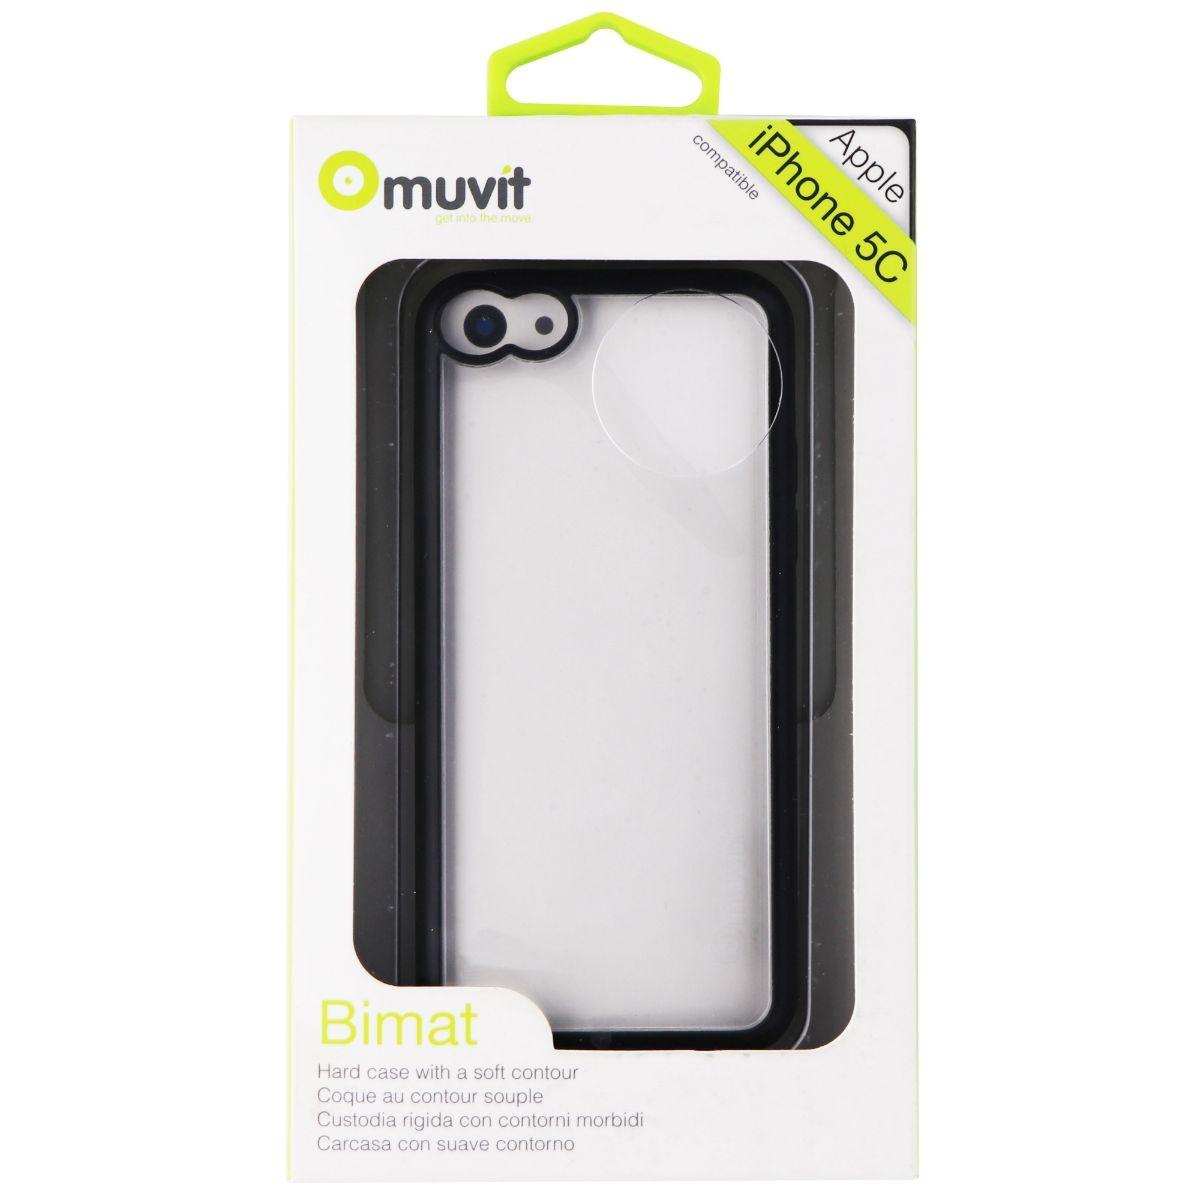 Muvit Bimet Series Hybrid Case for Apple iPhone 5C - Clear/Black